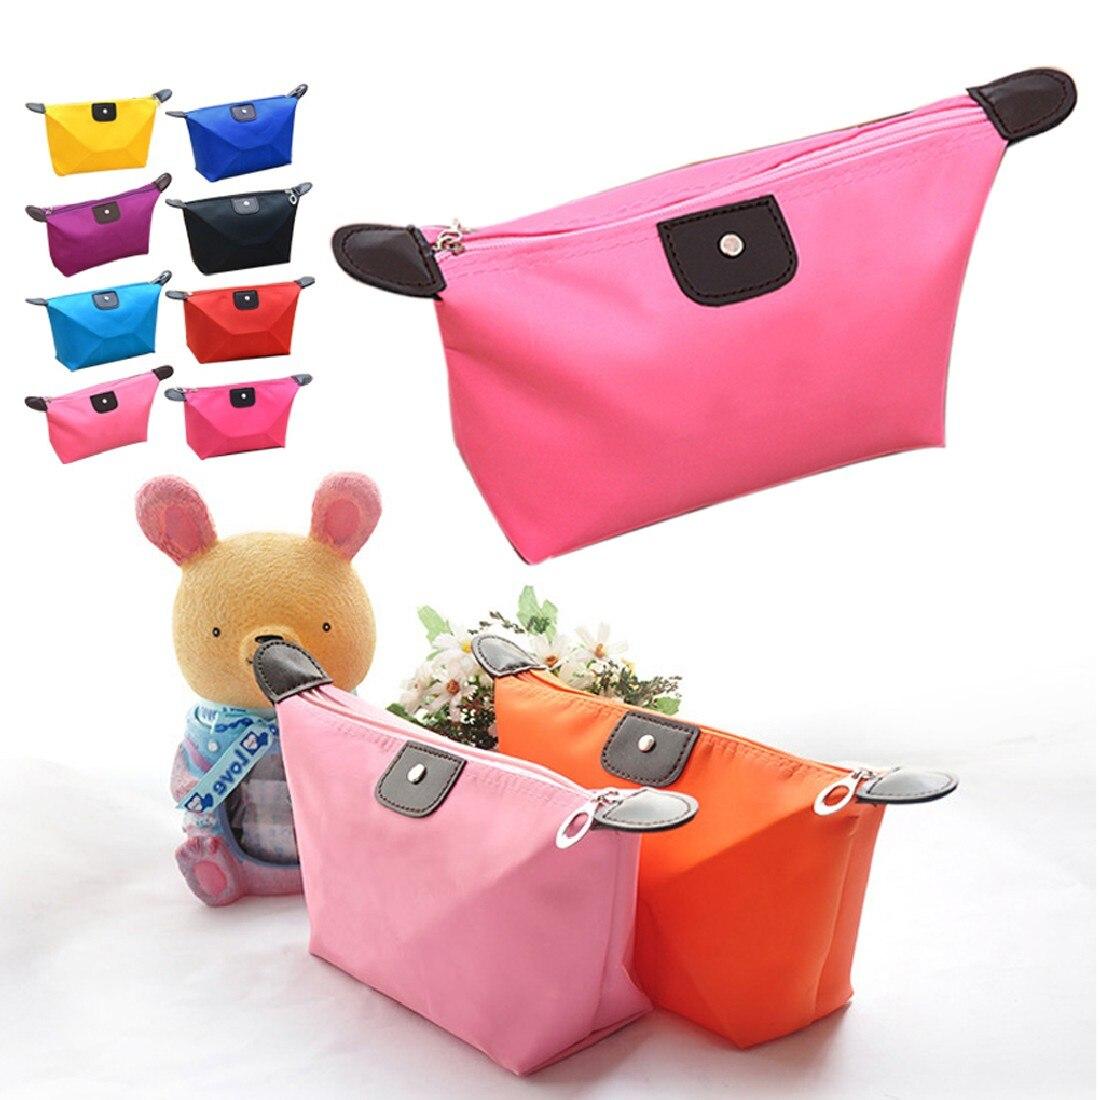 Fashion WomenS Pouch Bag Handbag Travel Make Up Cosmetic Purse Zipper Holder Organiser Storage Toiletry